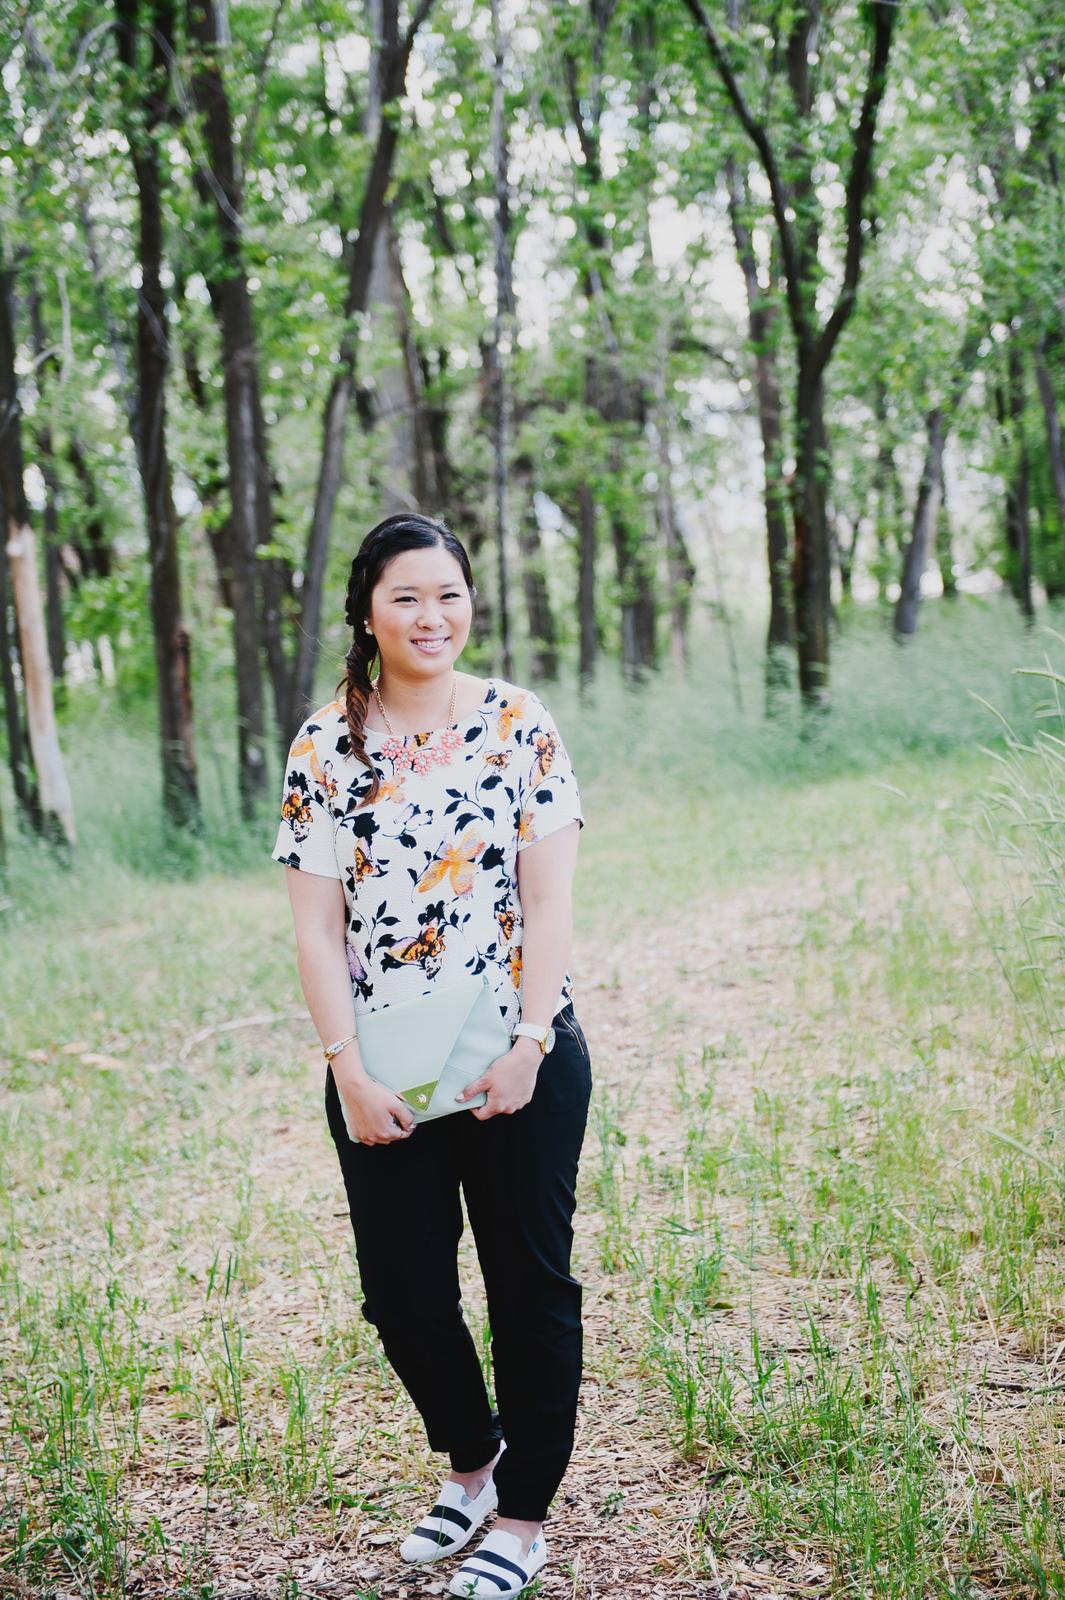 Sandy a la Mode | Fashion Blogger Florals and Striped Blu Kicks